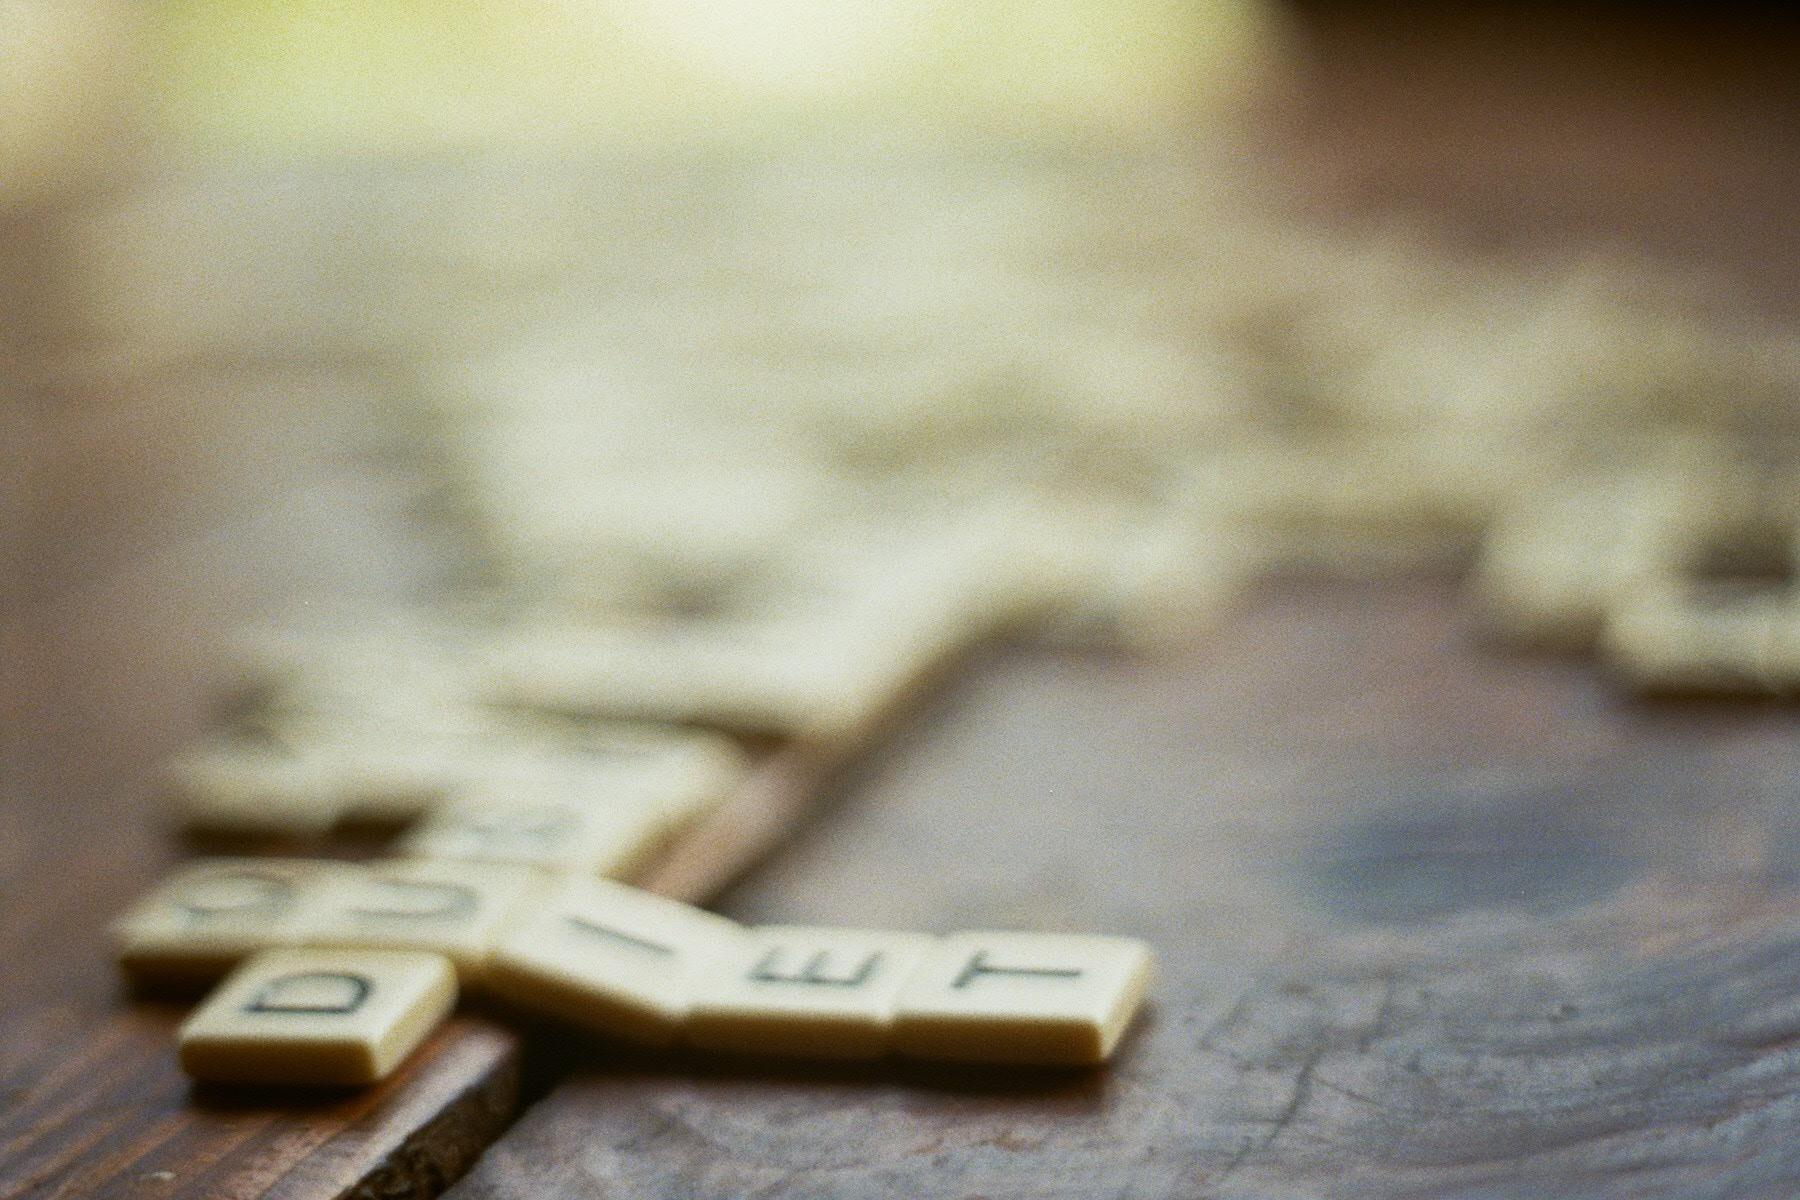 Scrabble tiles out of focus